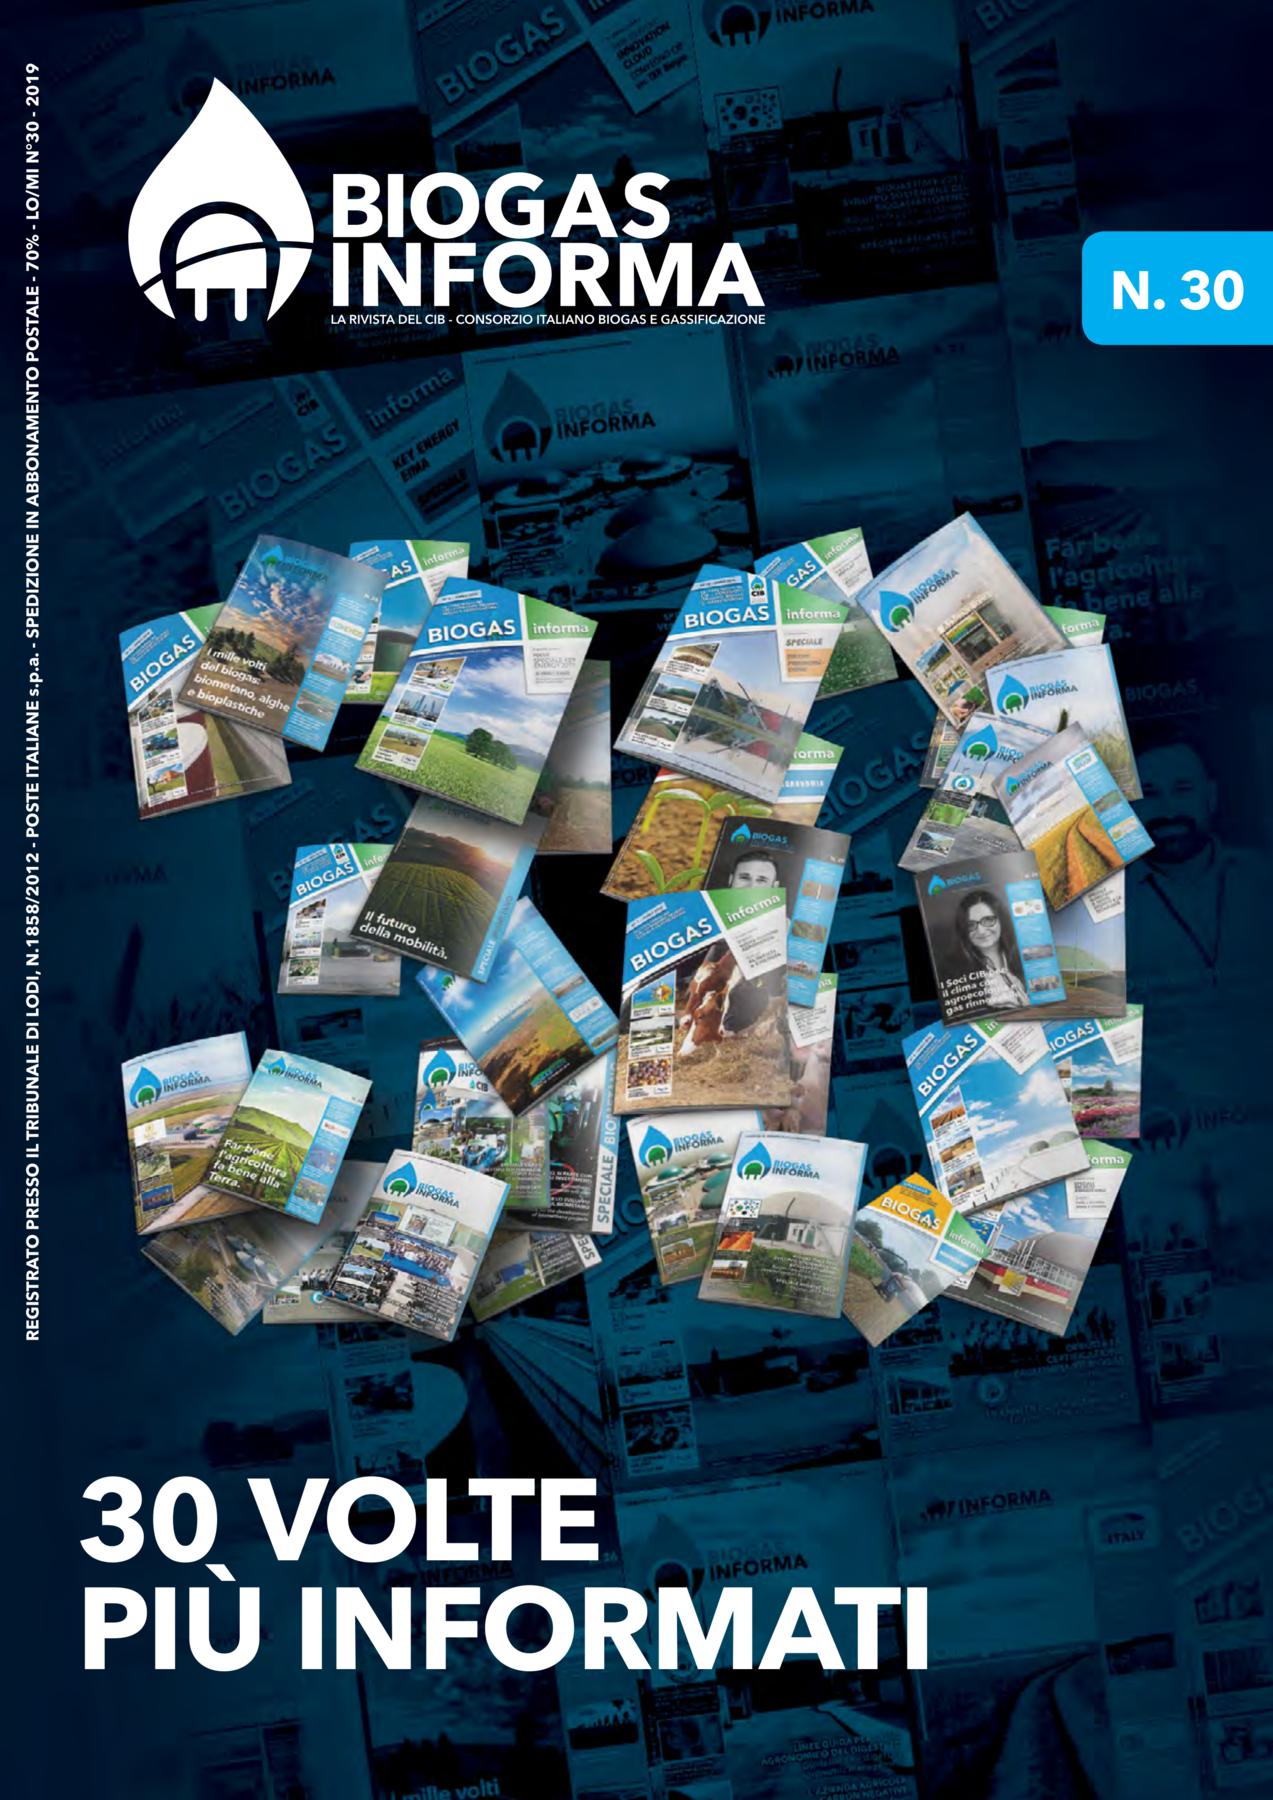 Copertina_BIOGAS_INFORMA_N30